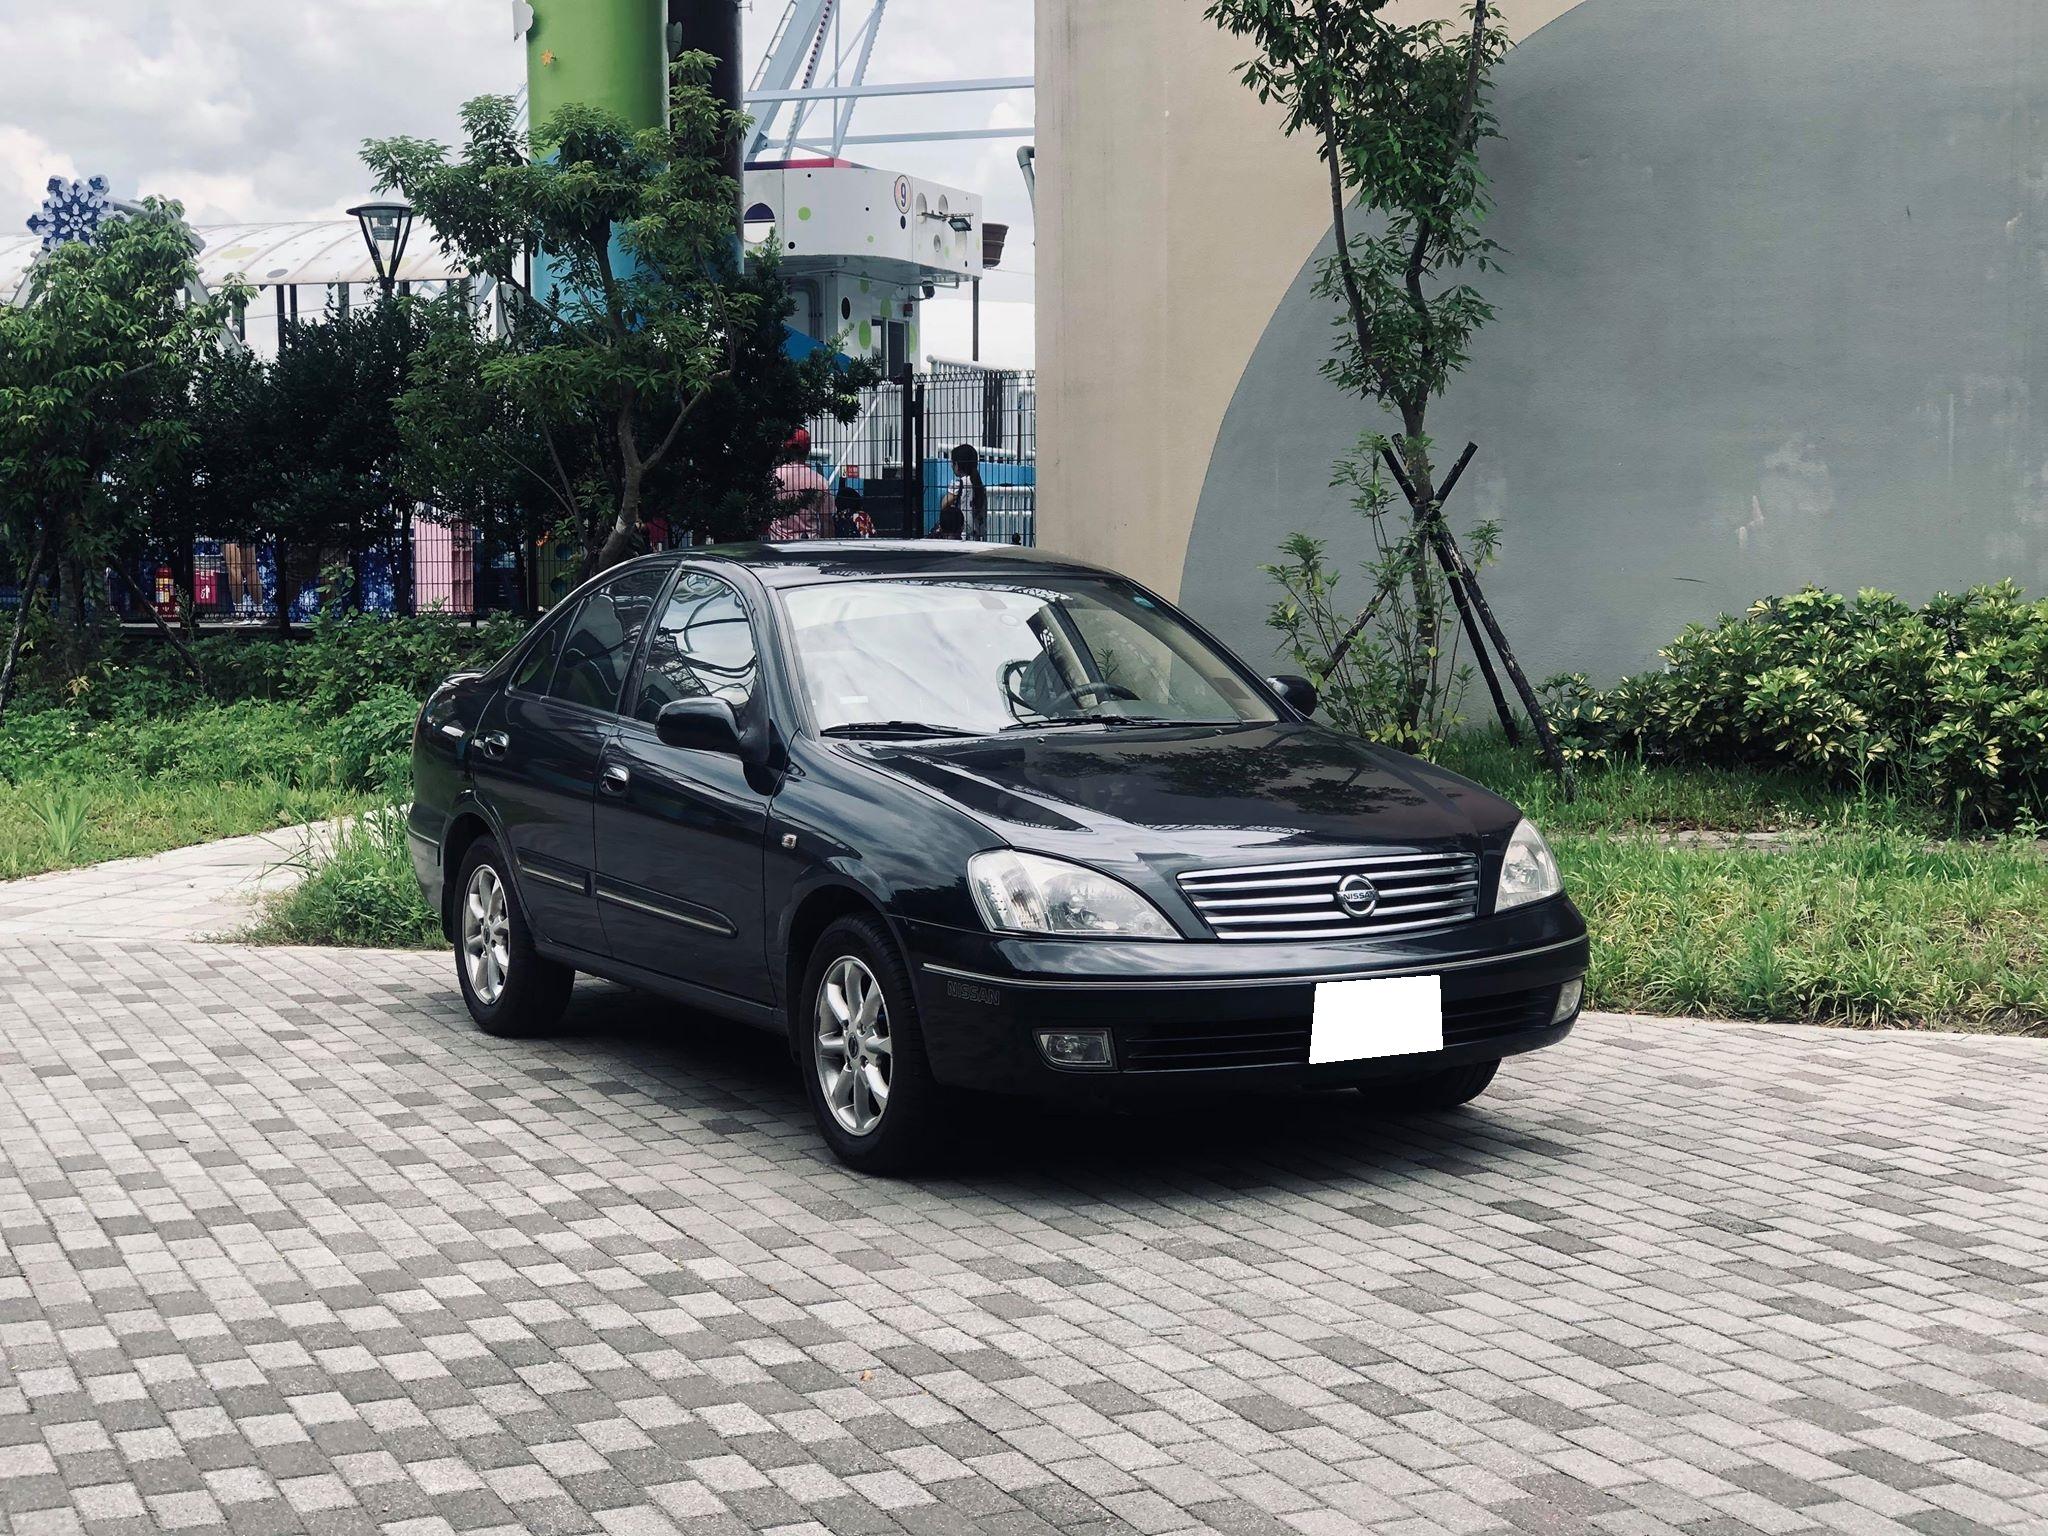 2003 Nissan 日產 Sentra